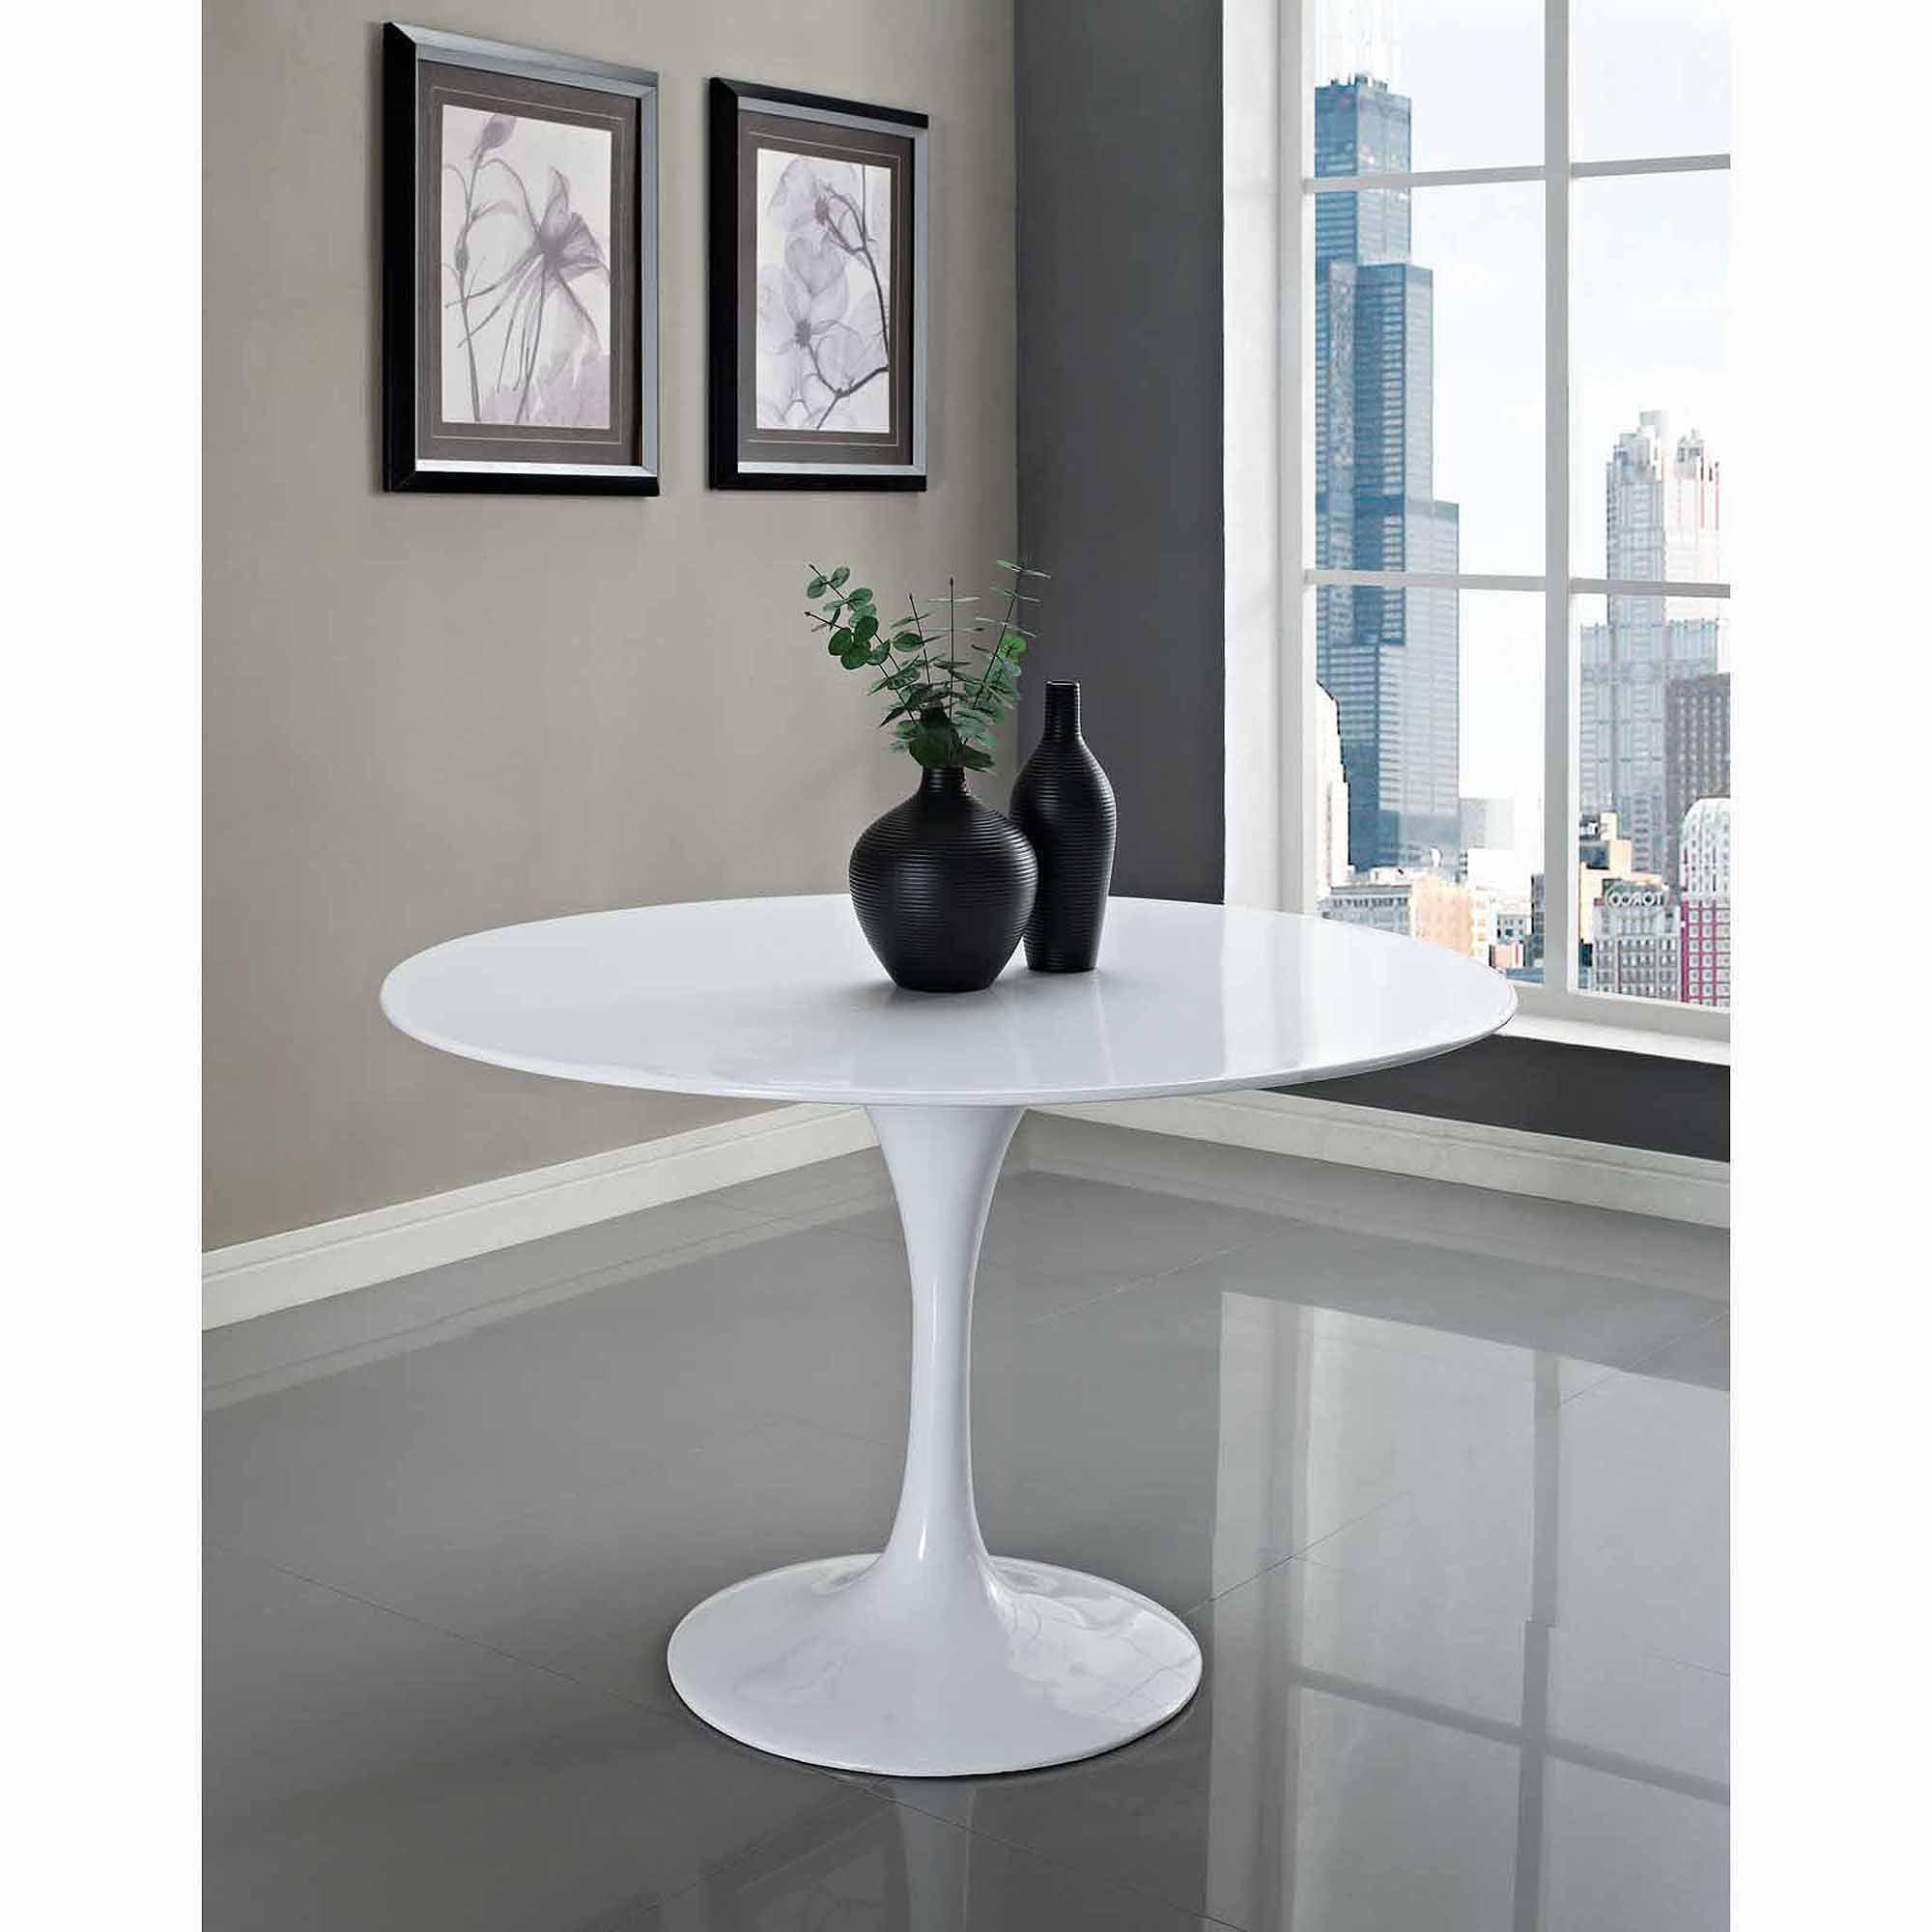 "Modway Lippa 48"" Fiberglass Dining Table Multiple Colors"